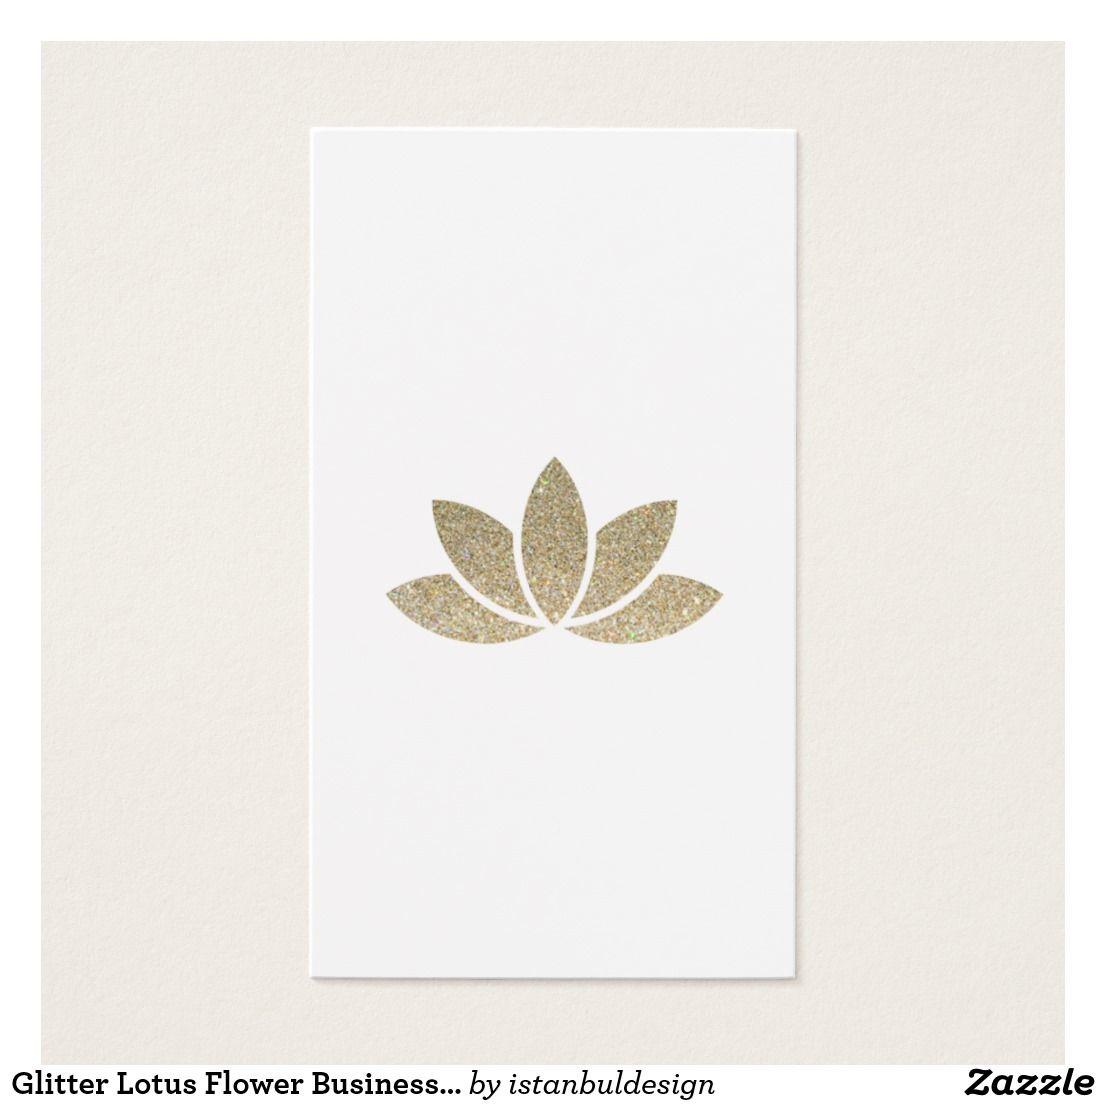 Glitter Lotus Flower Business Card | Business cards